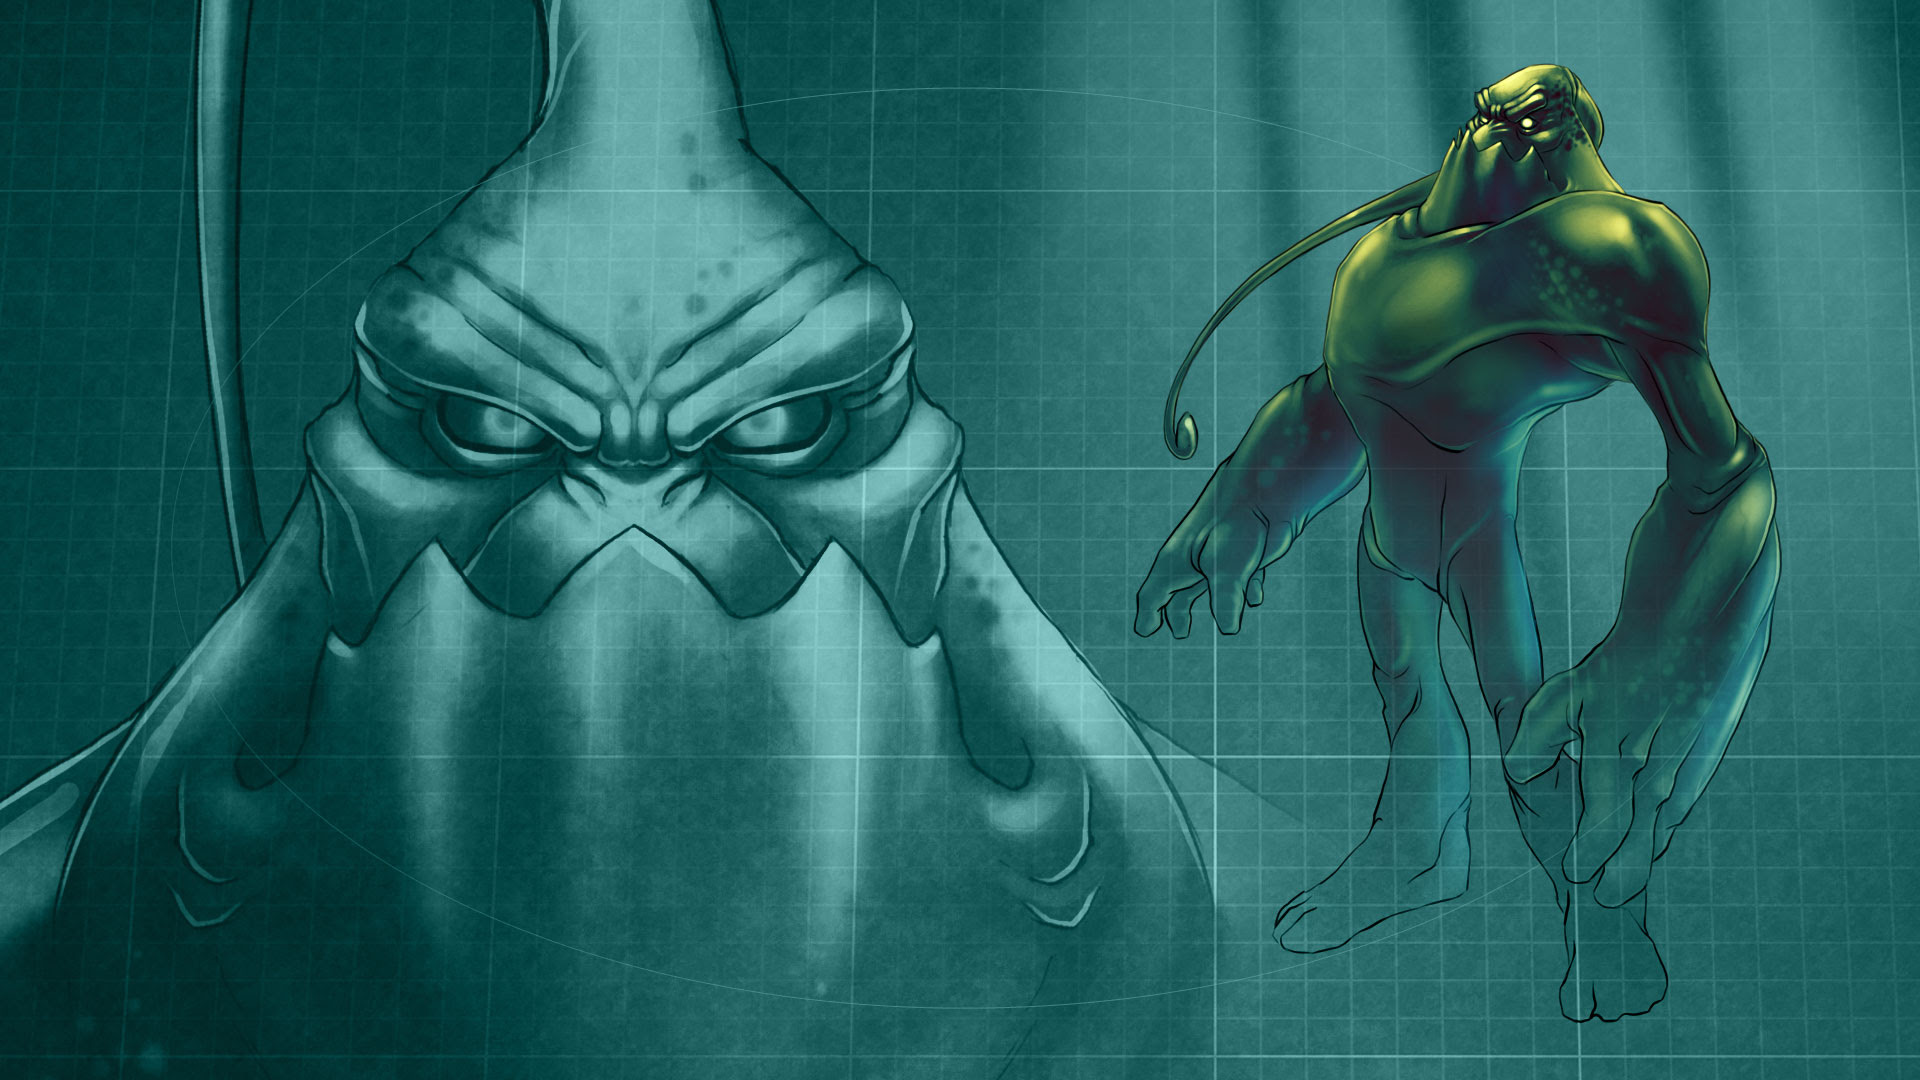 Zac League Of Legends Wallpapers